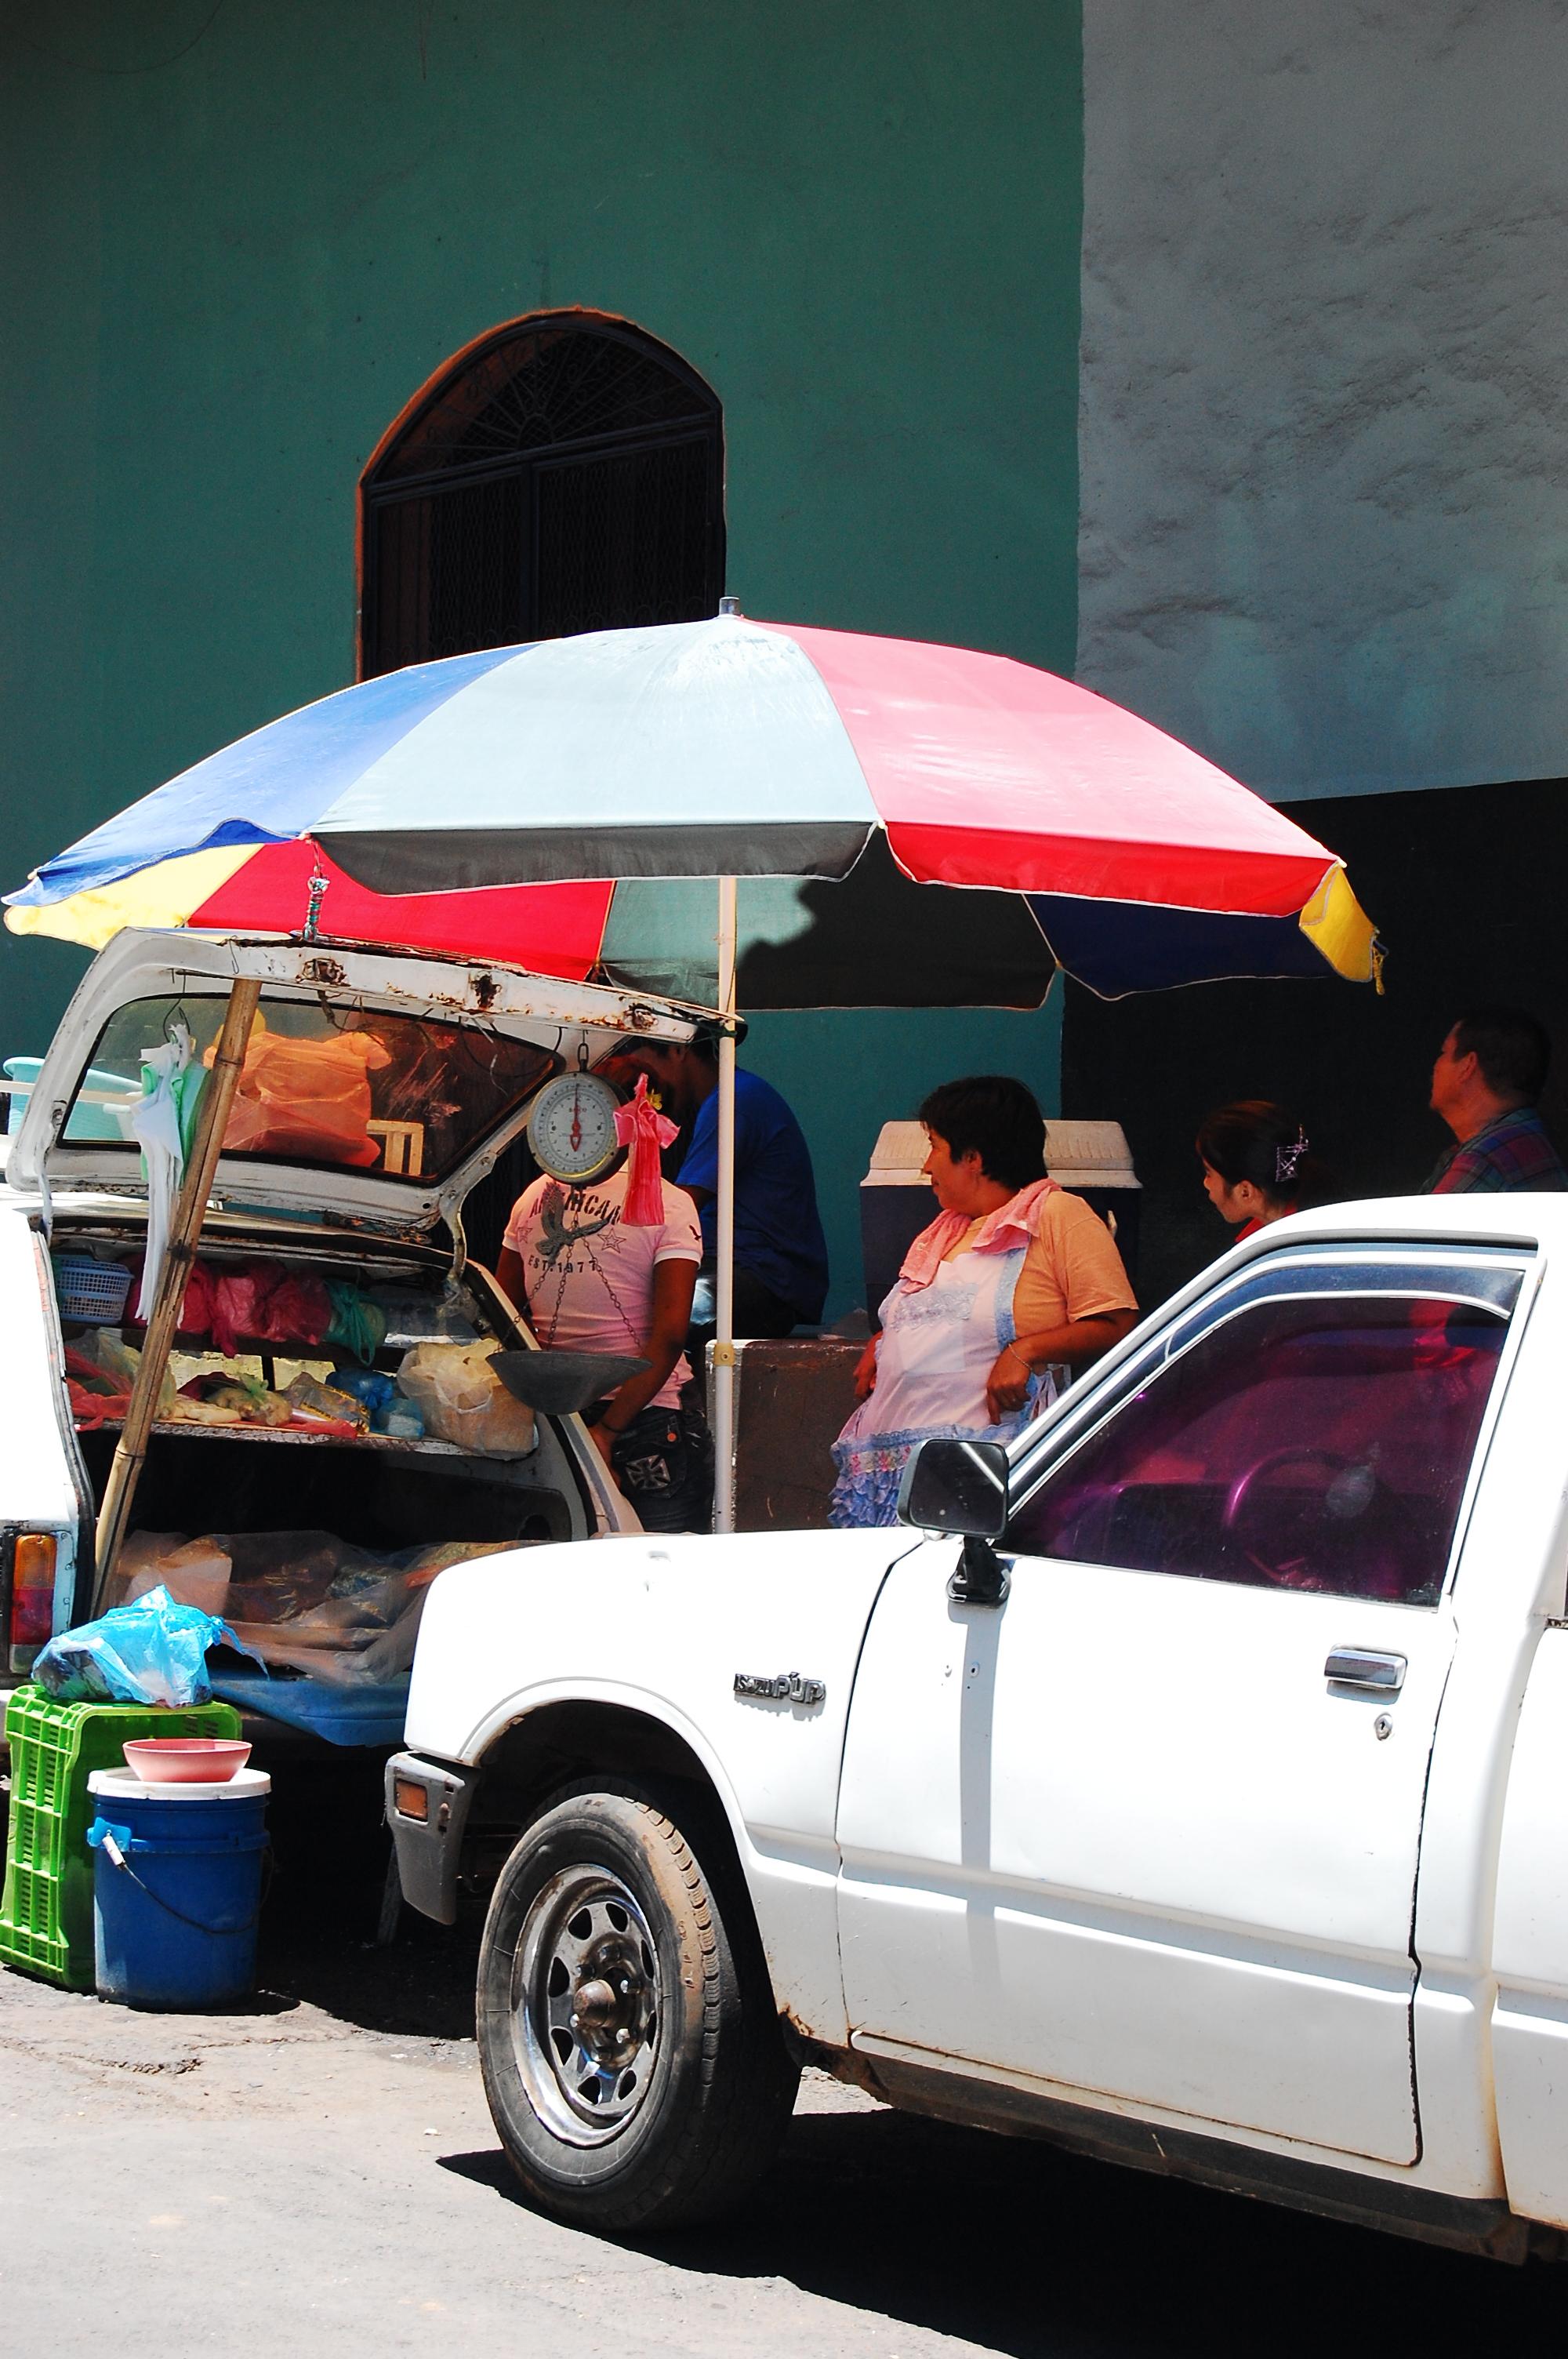 Nicaragua - Irene Mendez